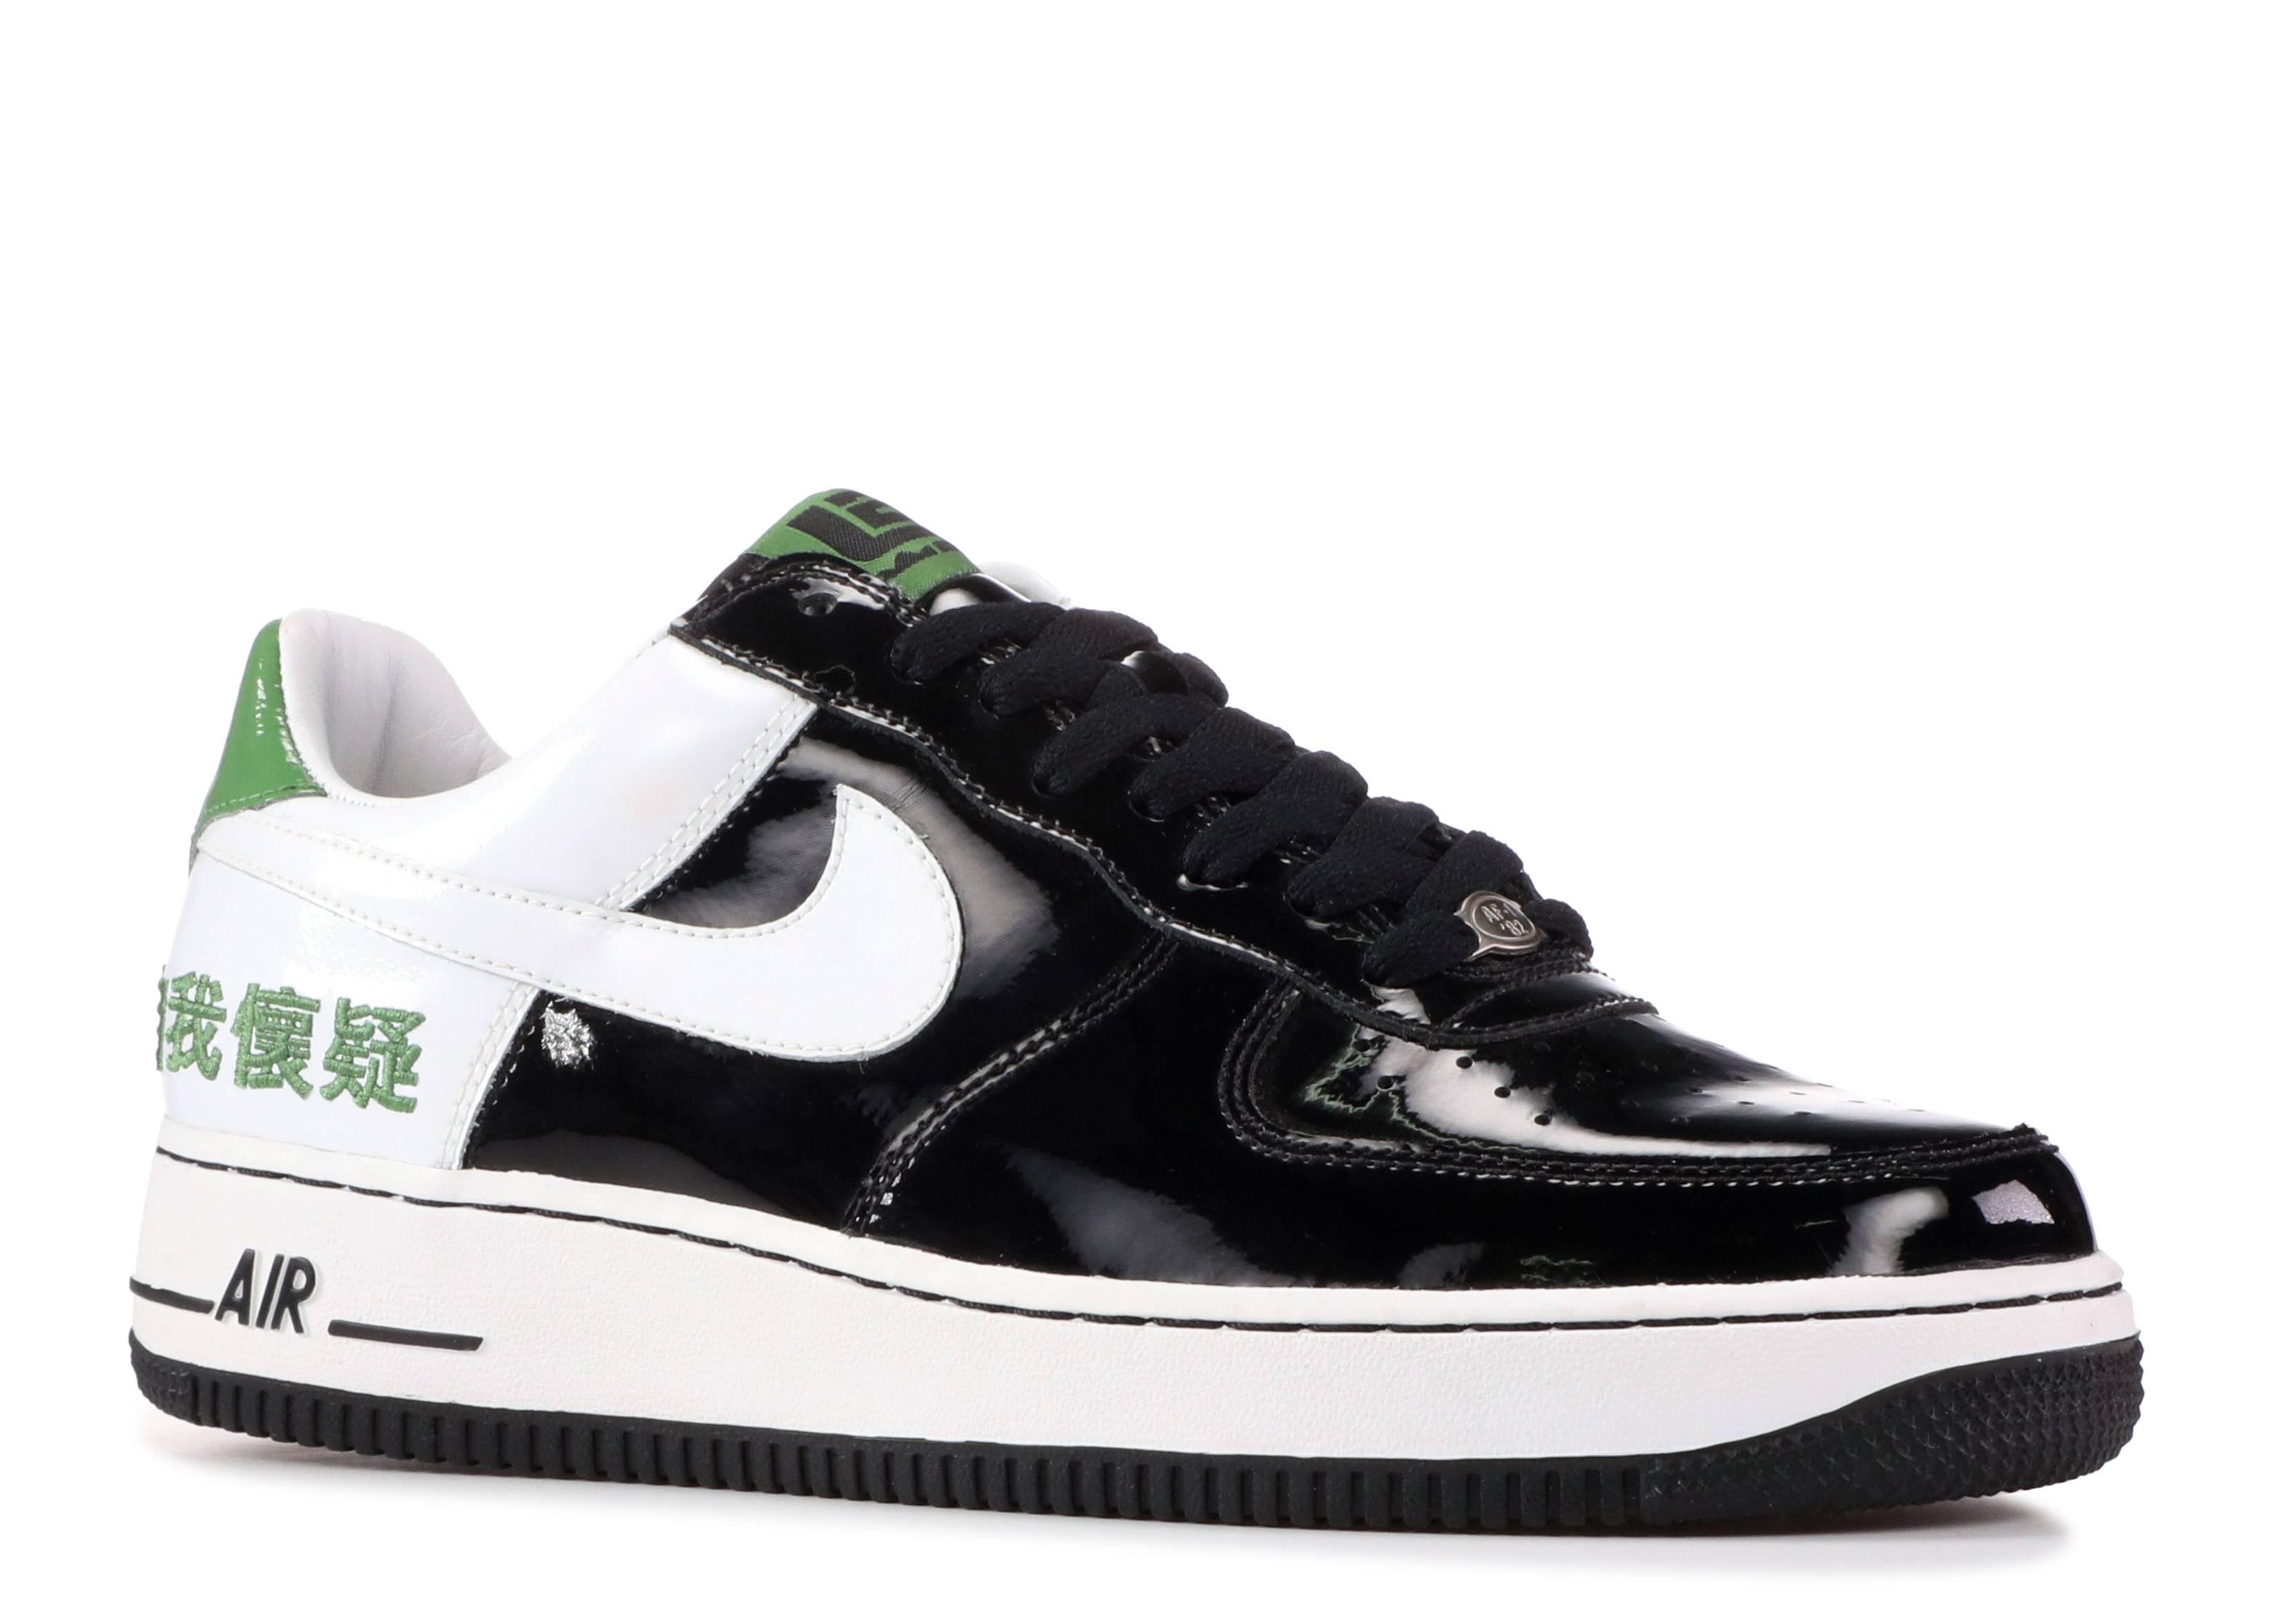 7f69b21f3ec1 Nike Air Force 1 Low